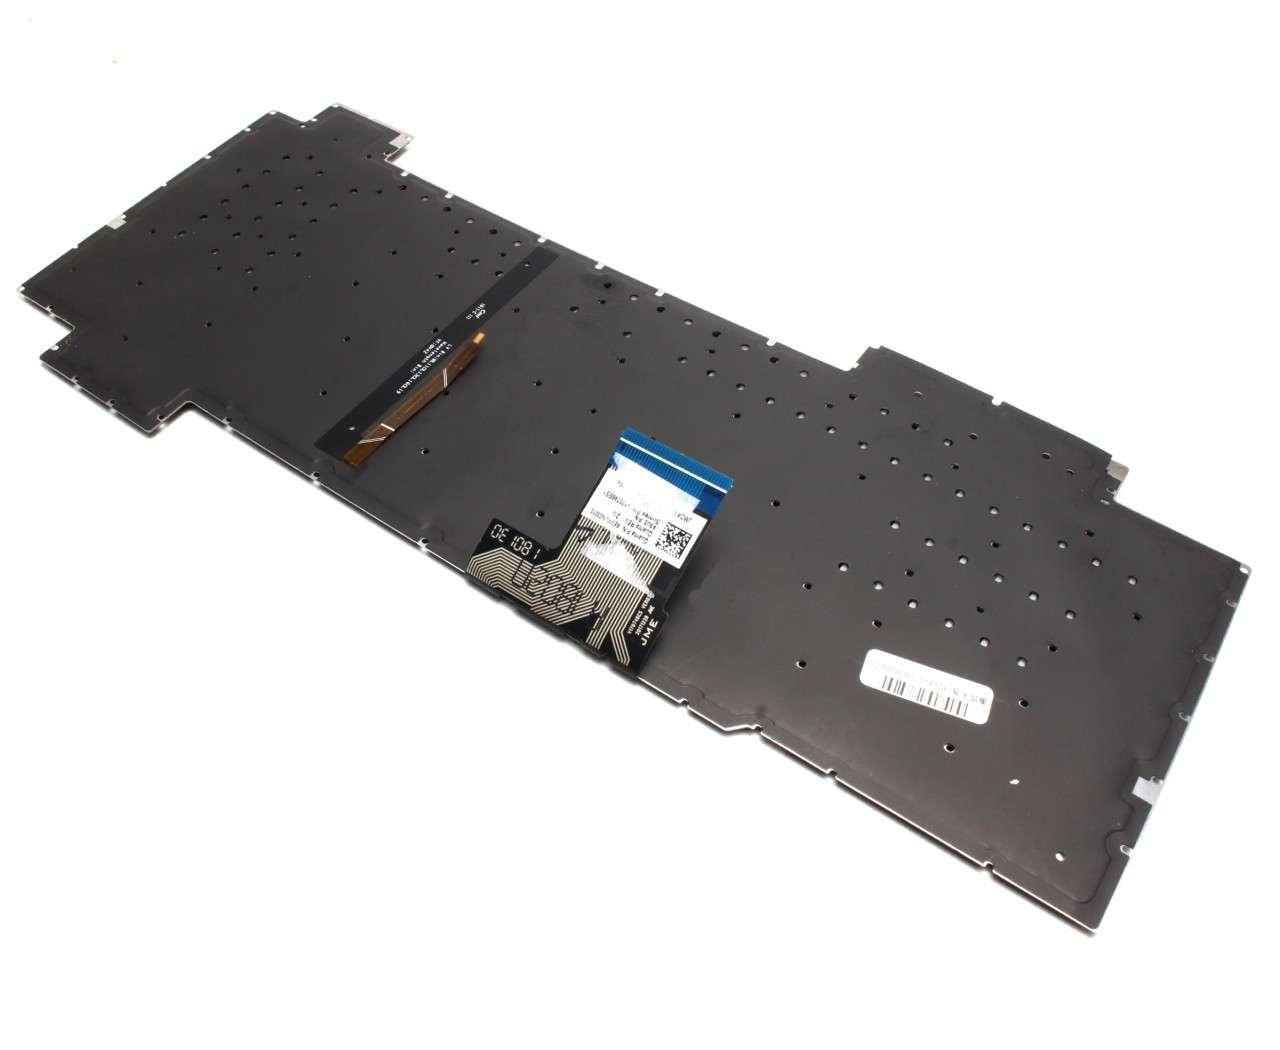 Tastatura neagra cu iluminare rosie pe marginea tastelor Asus TUF Gaming FX504GM iluminata layout US fara rama enter mic imagine powerlaptop.ro 2021